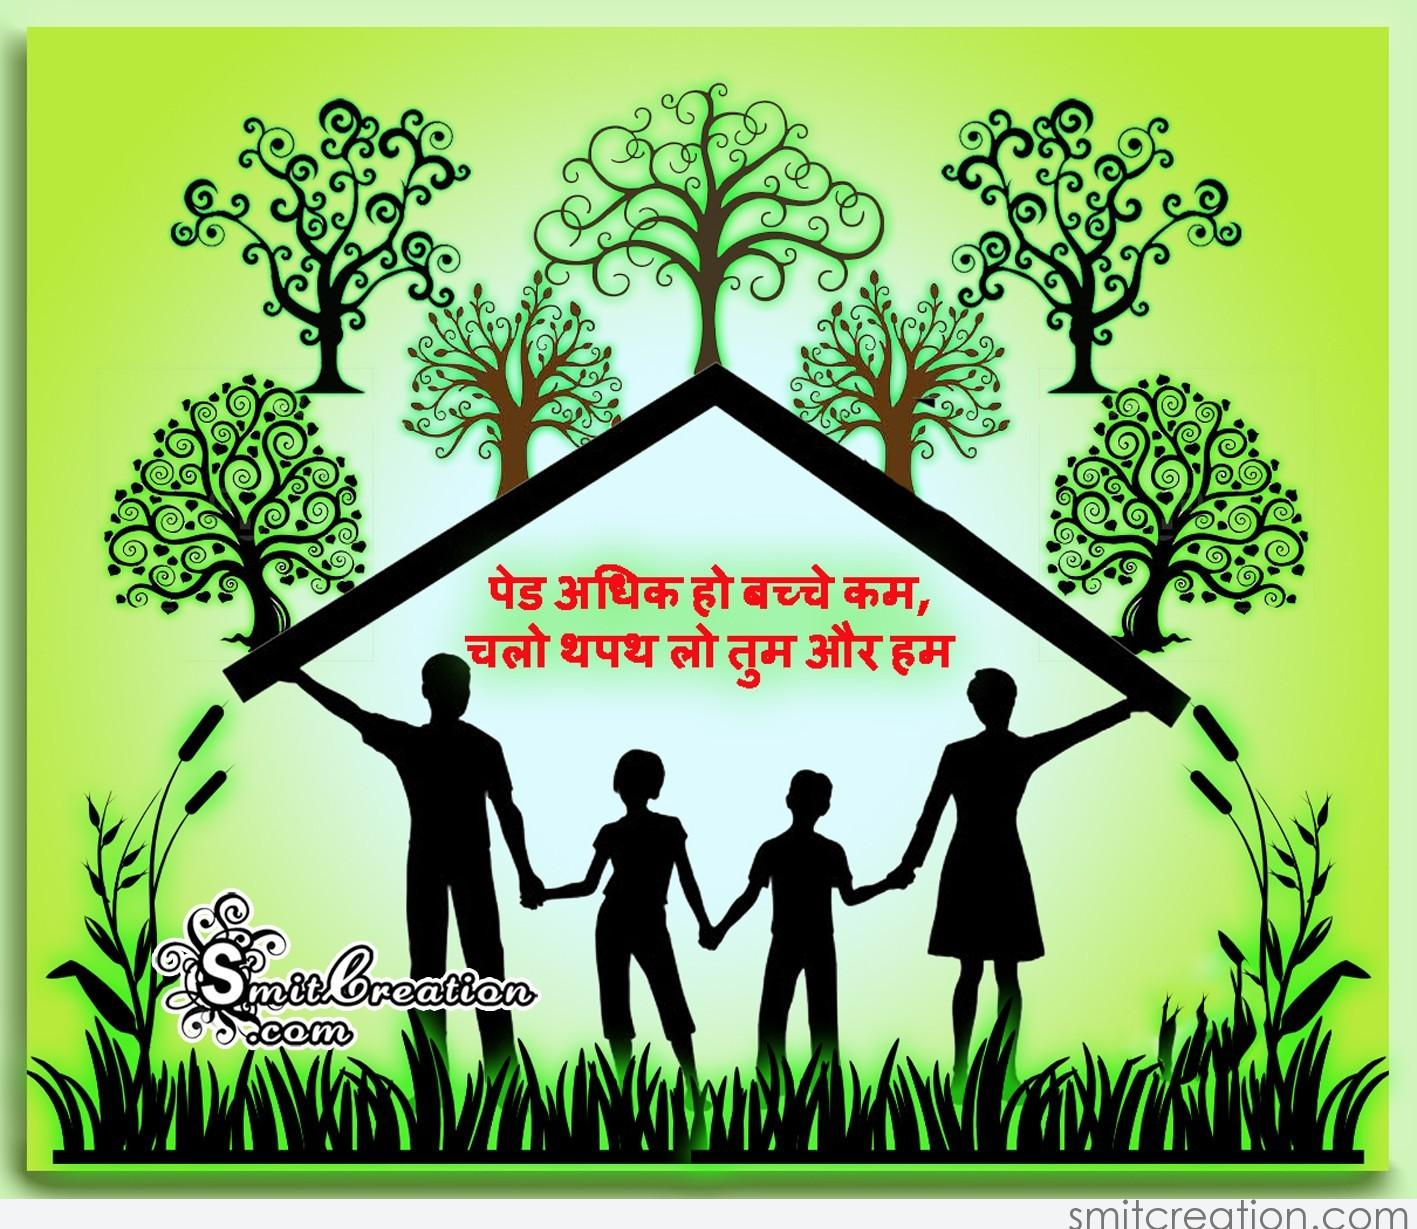 essay on vriksharopan Short essay on 'tree plantation' in hindi | 'vriksharopan' par nibandh (270 words) - 124914.